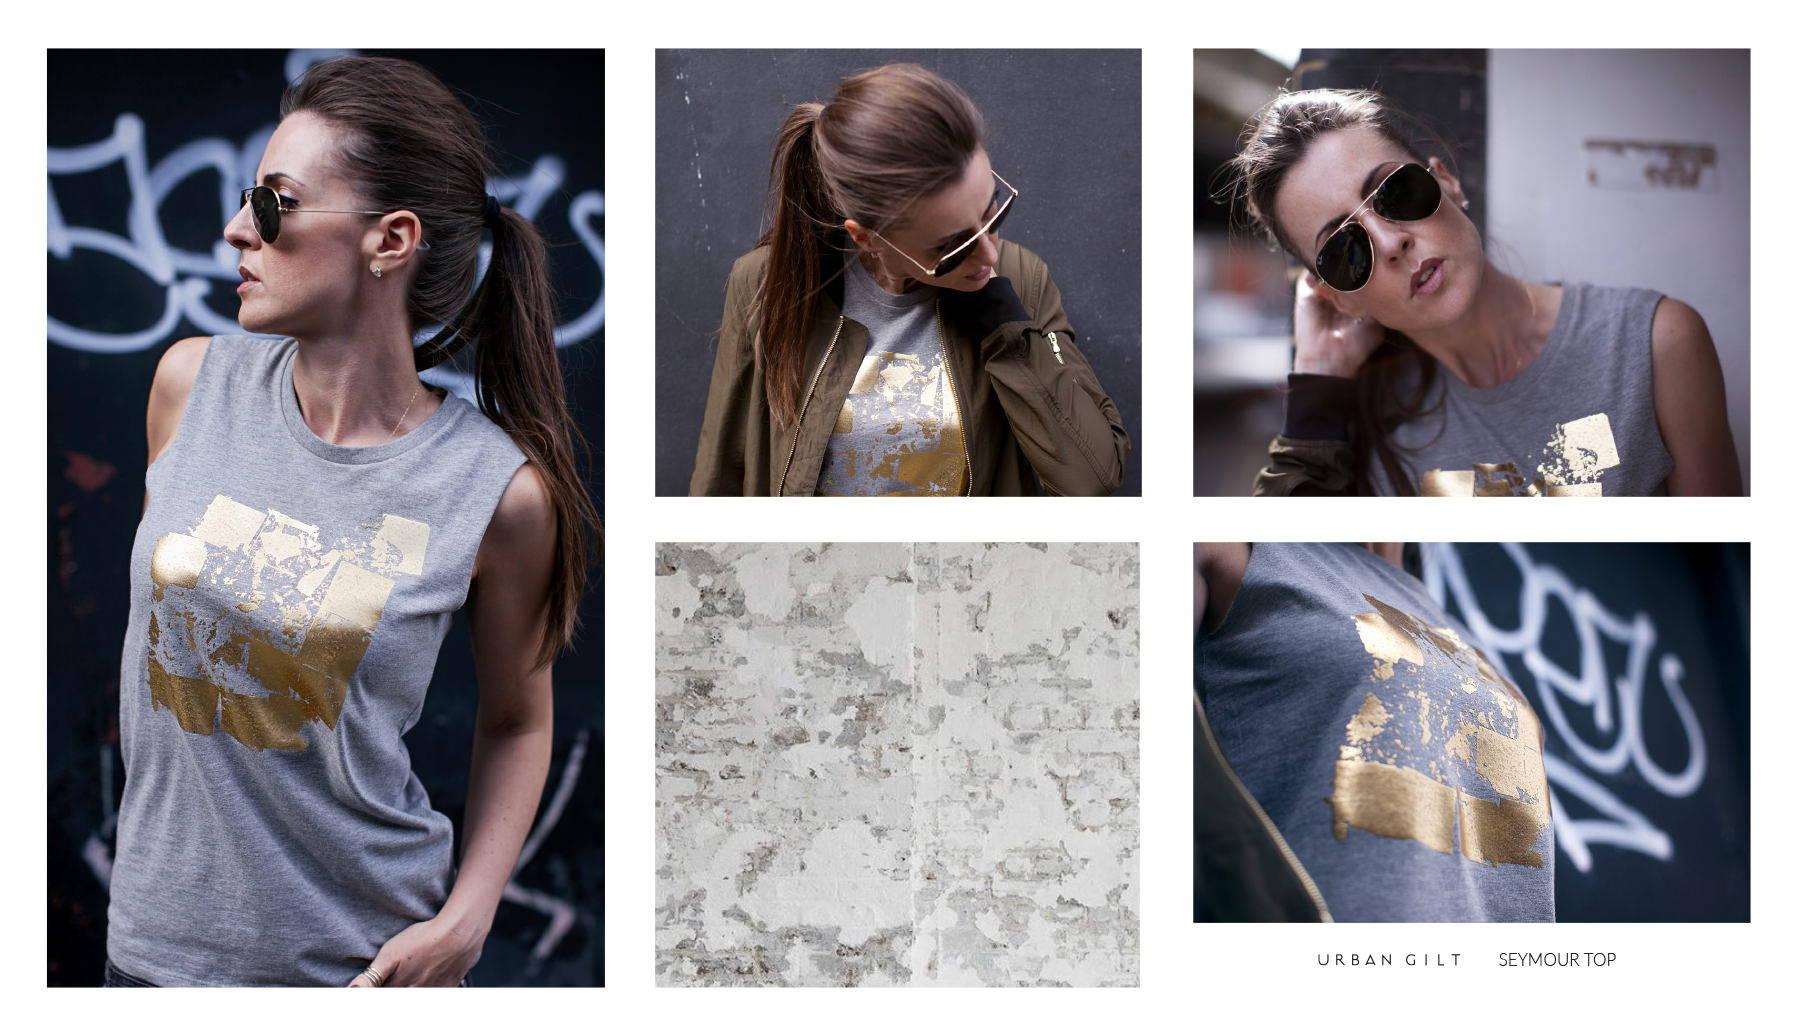 Urban Gilt Lookbook | Urban Textures | Seymour Top